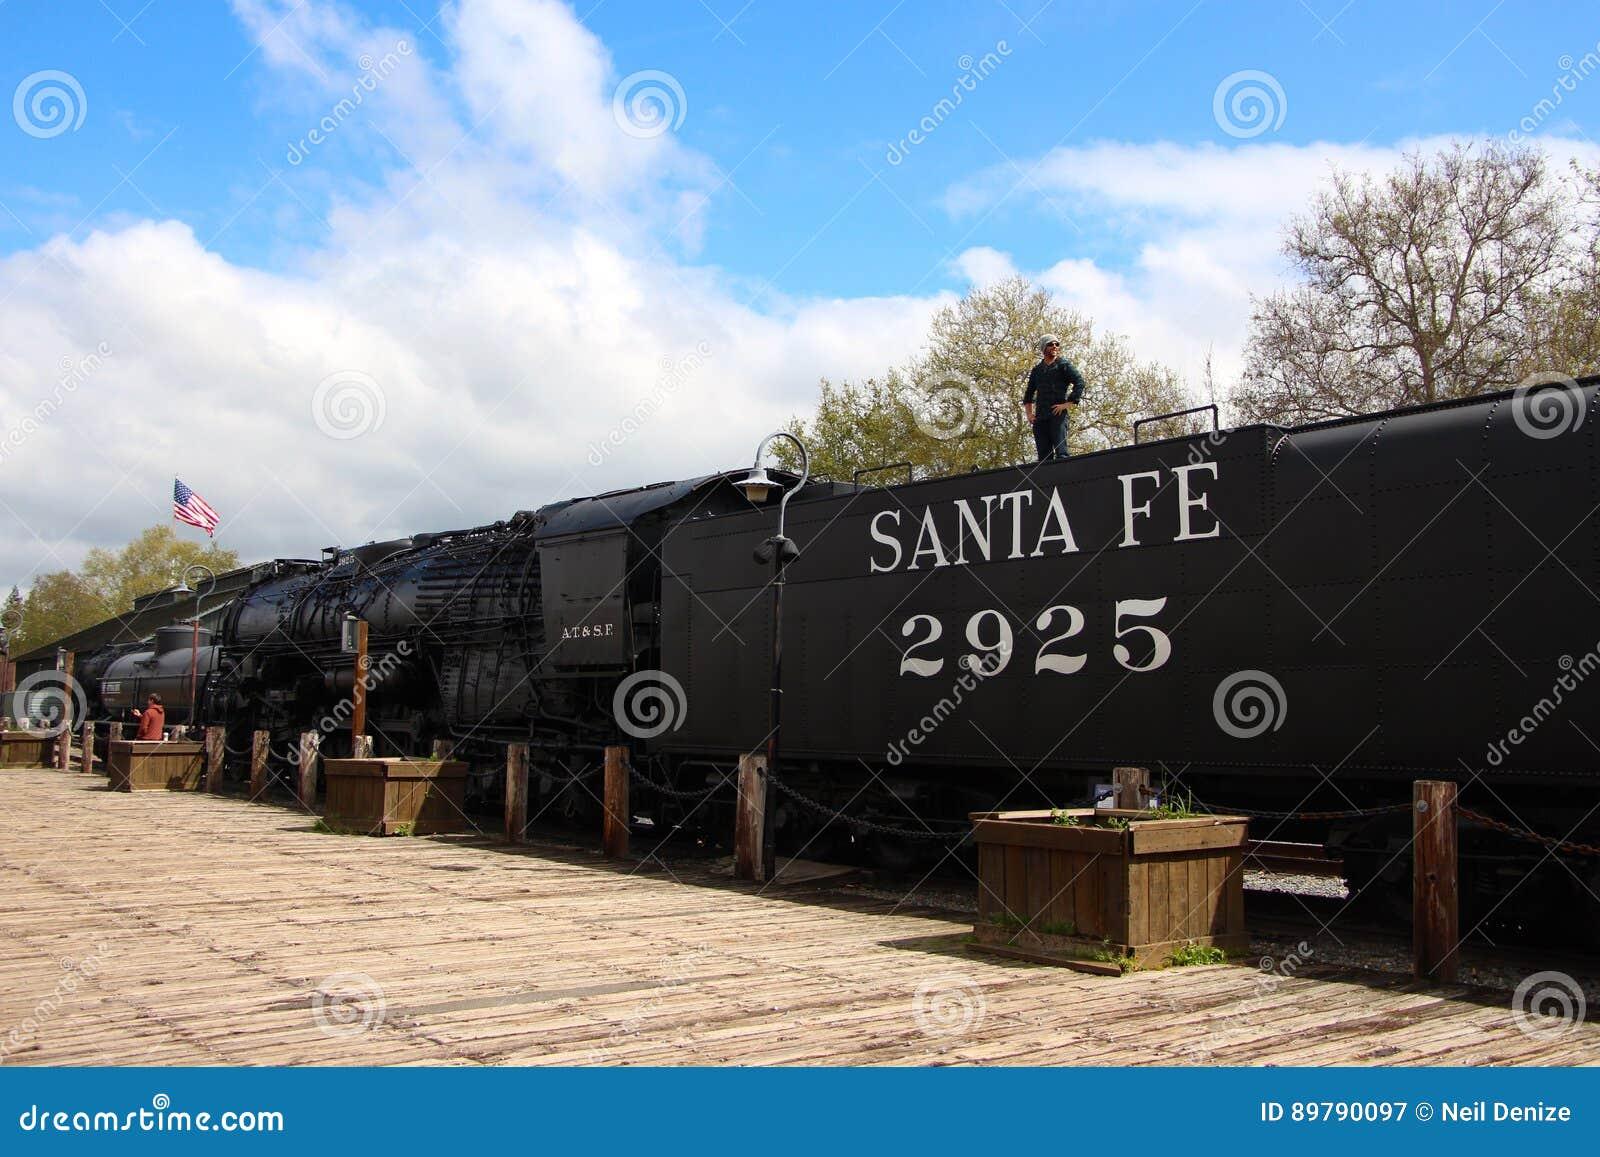 Old Town Sacramento Train California USA